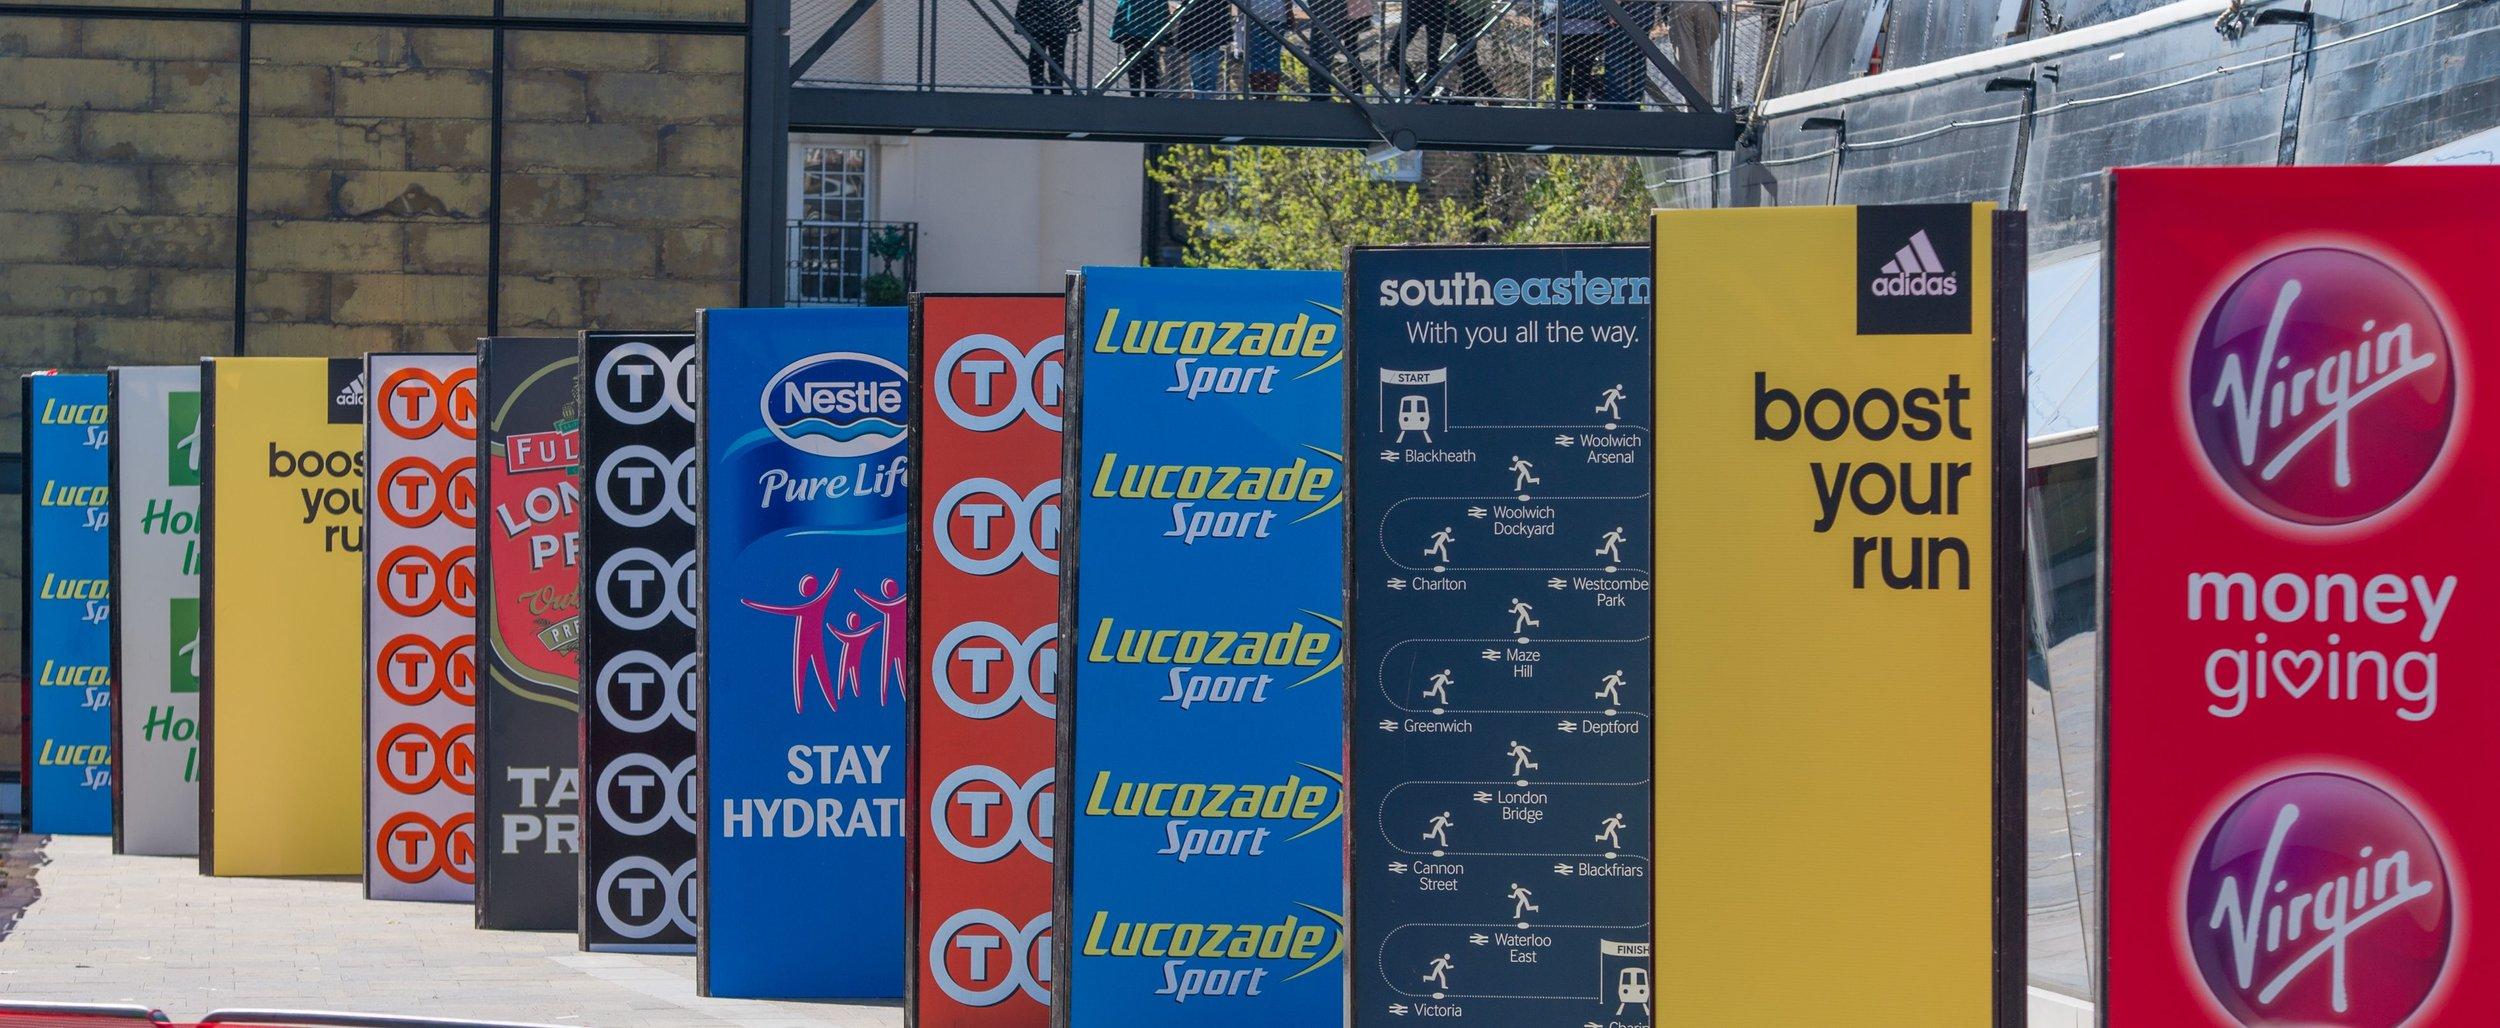 London Marathon_APCG5.JPG